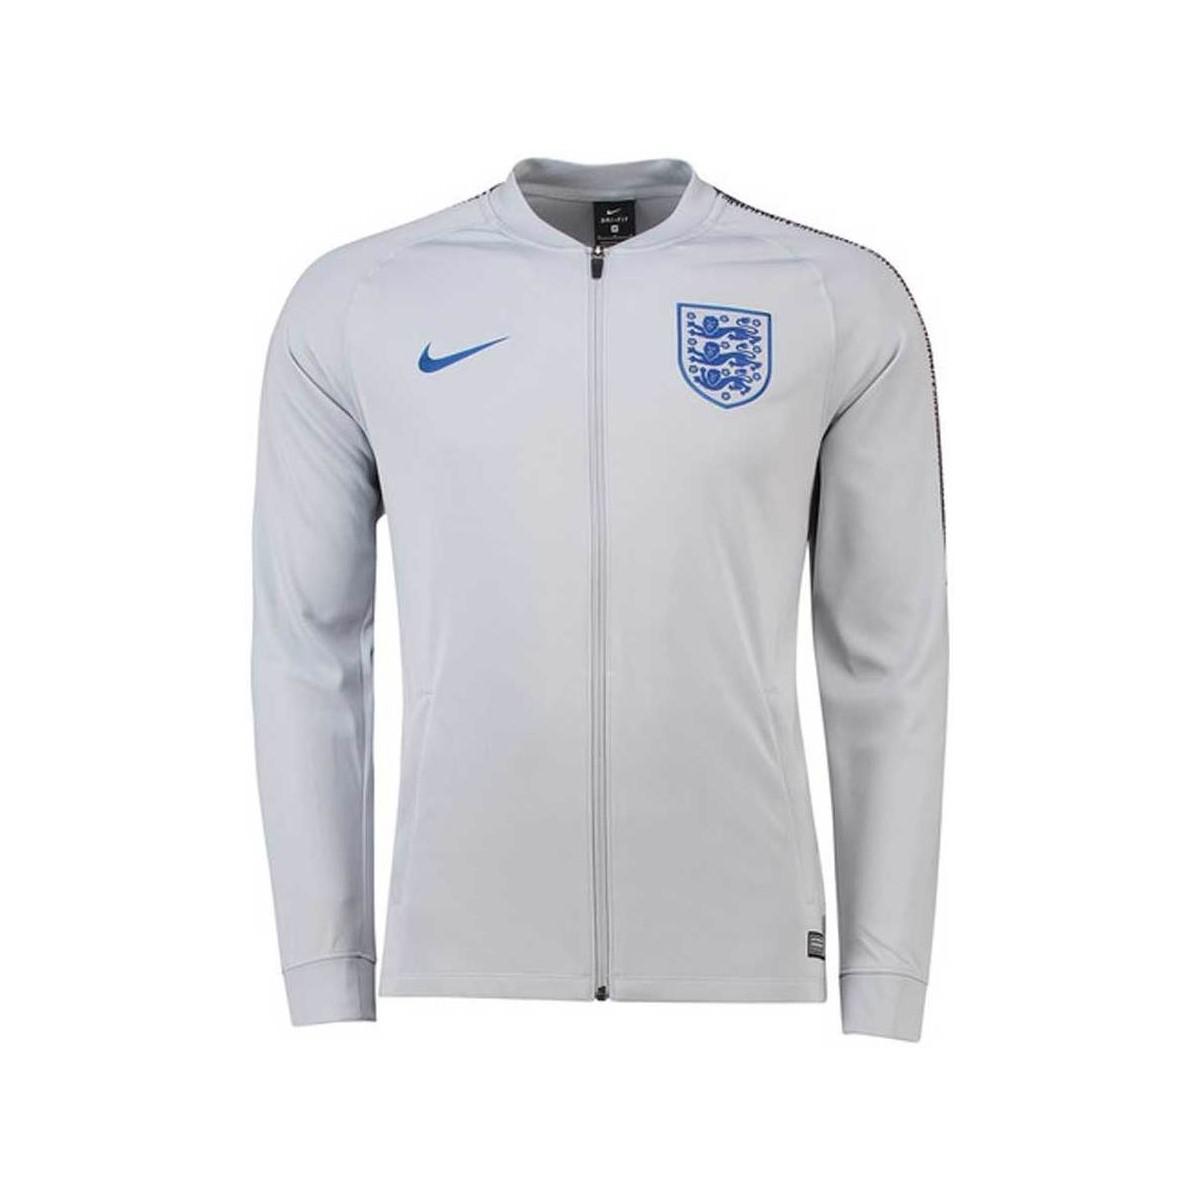 Lyst - Nike 2018-2019 England Squad Track Jacket Women s Sweatshirt ... 0c535a51c72